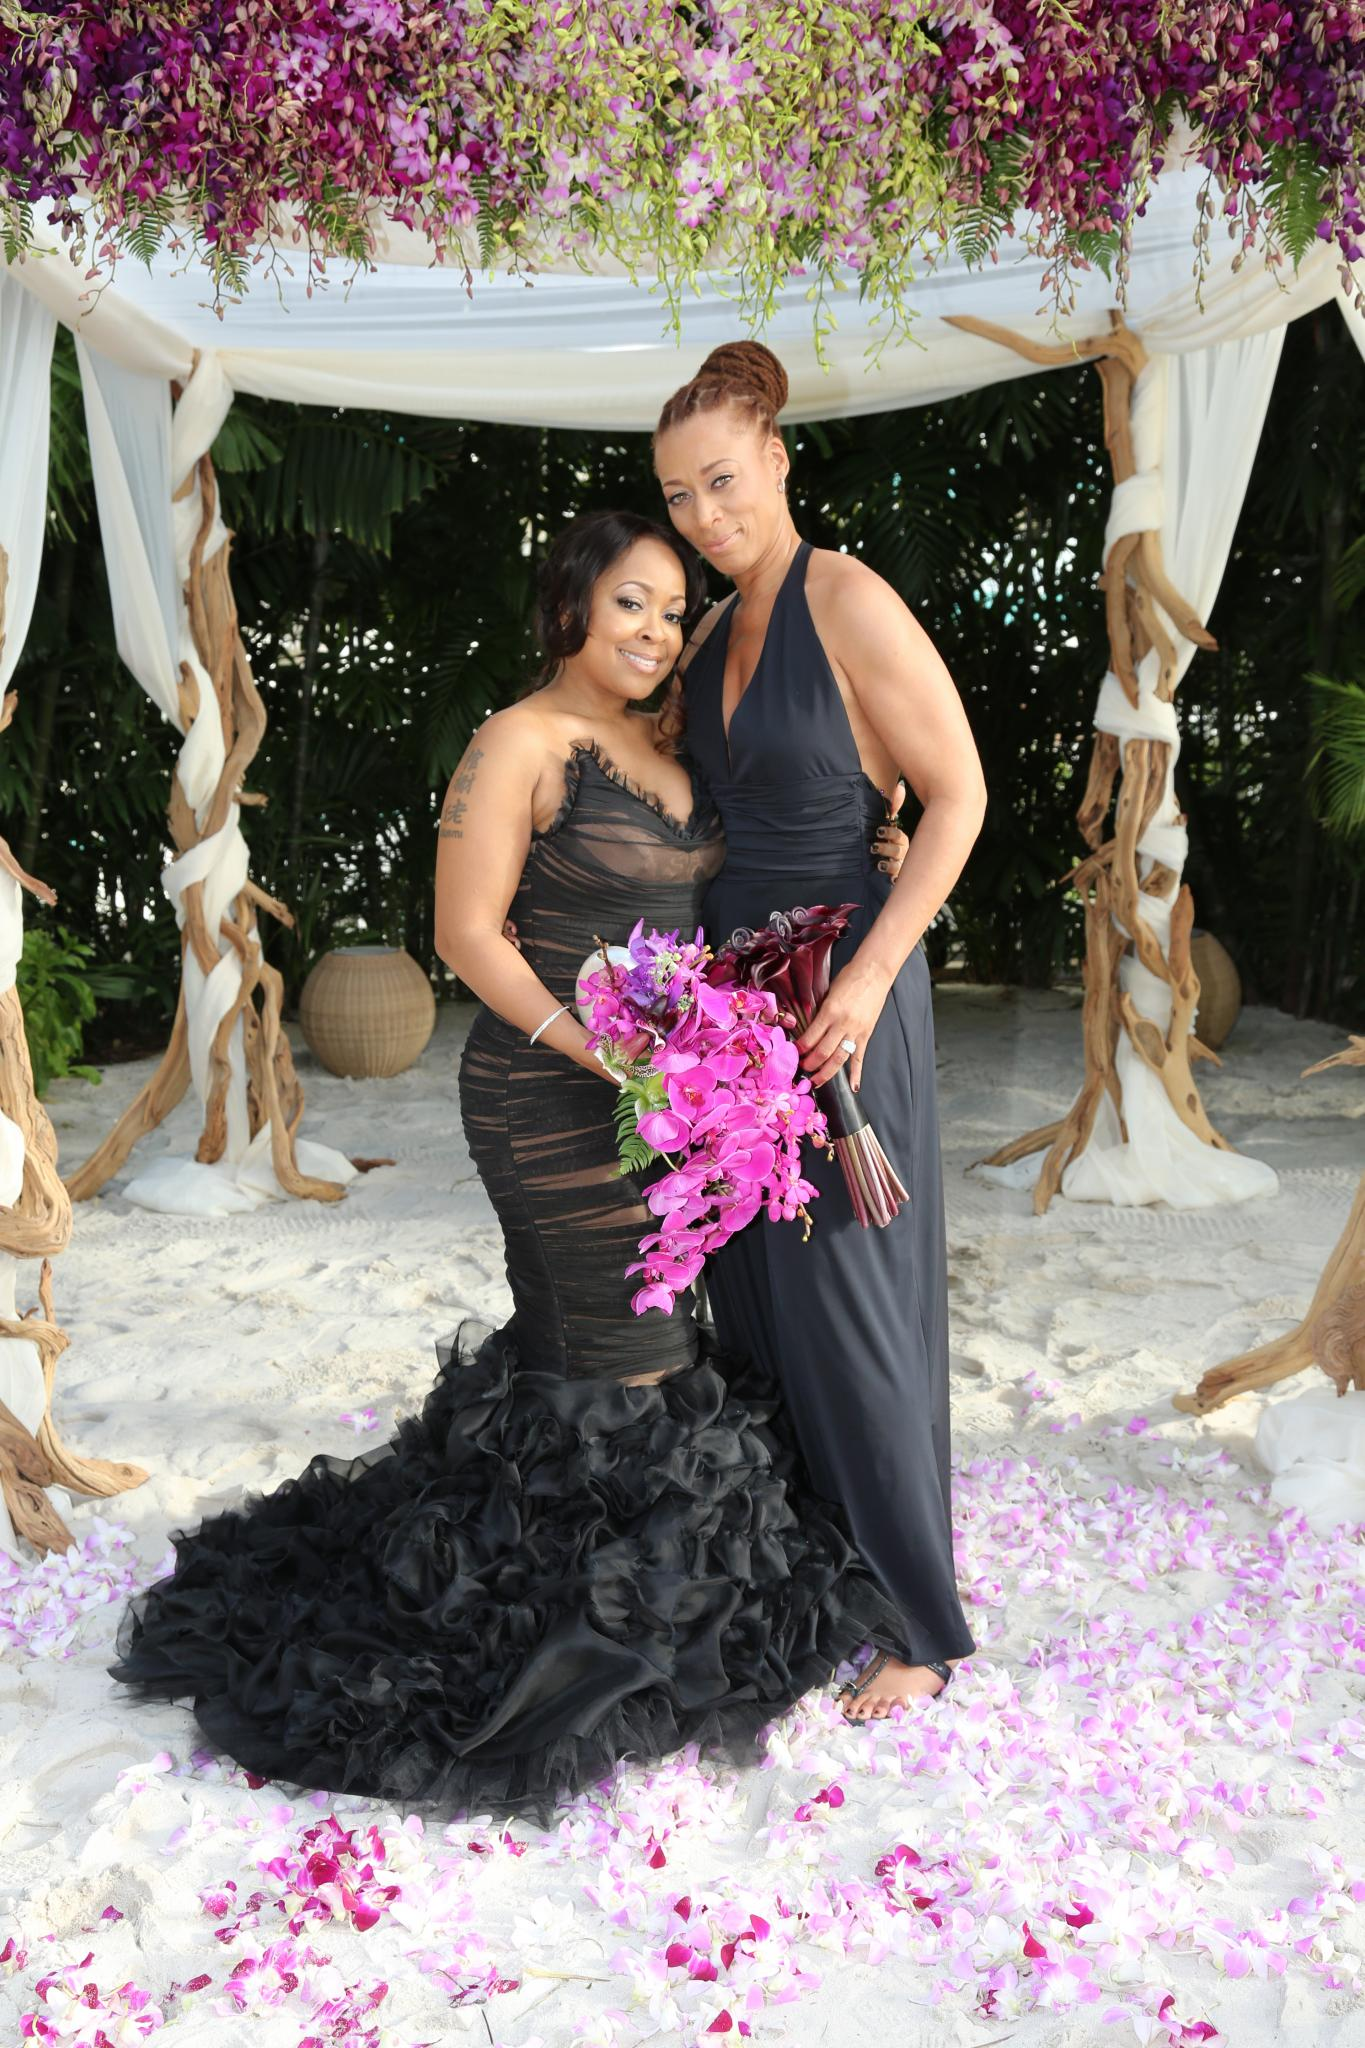 Exclusive: Inside 'R&B Divas' Star Monifah's Hawaiian Wedding Day